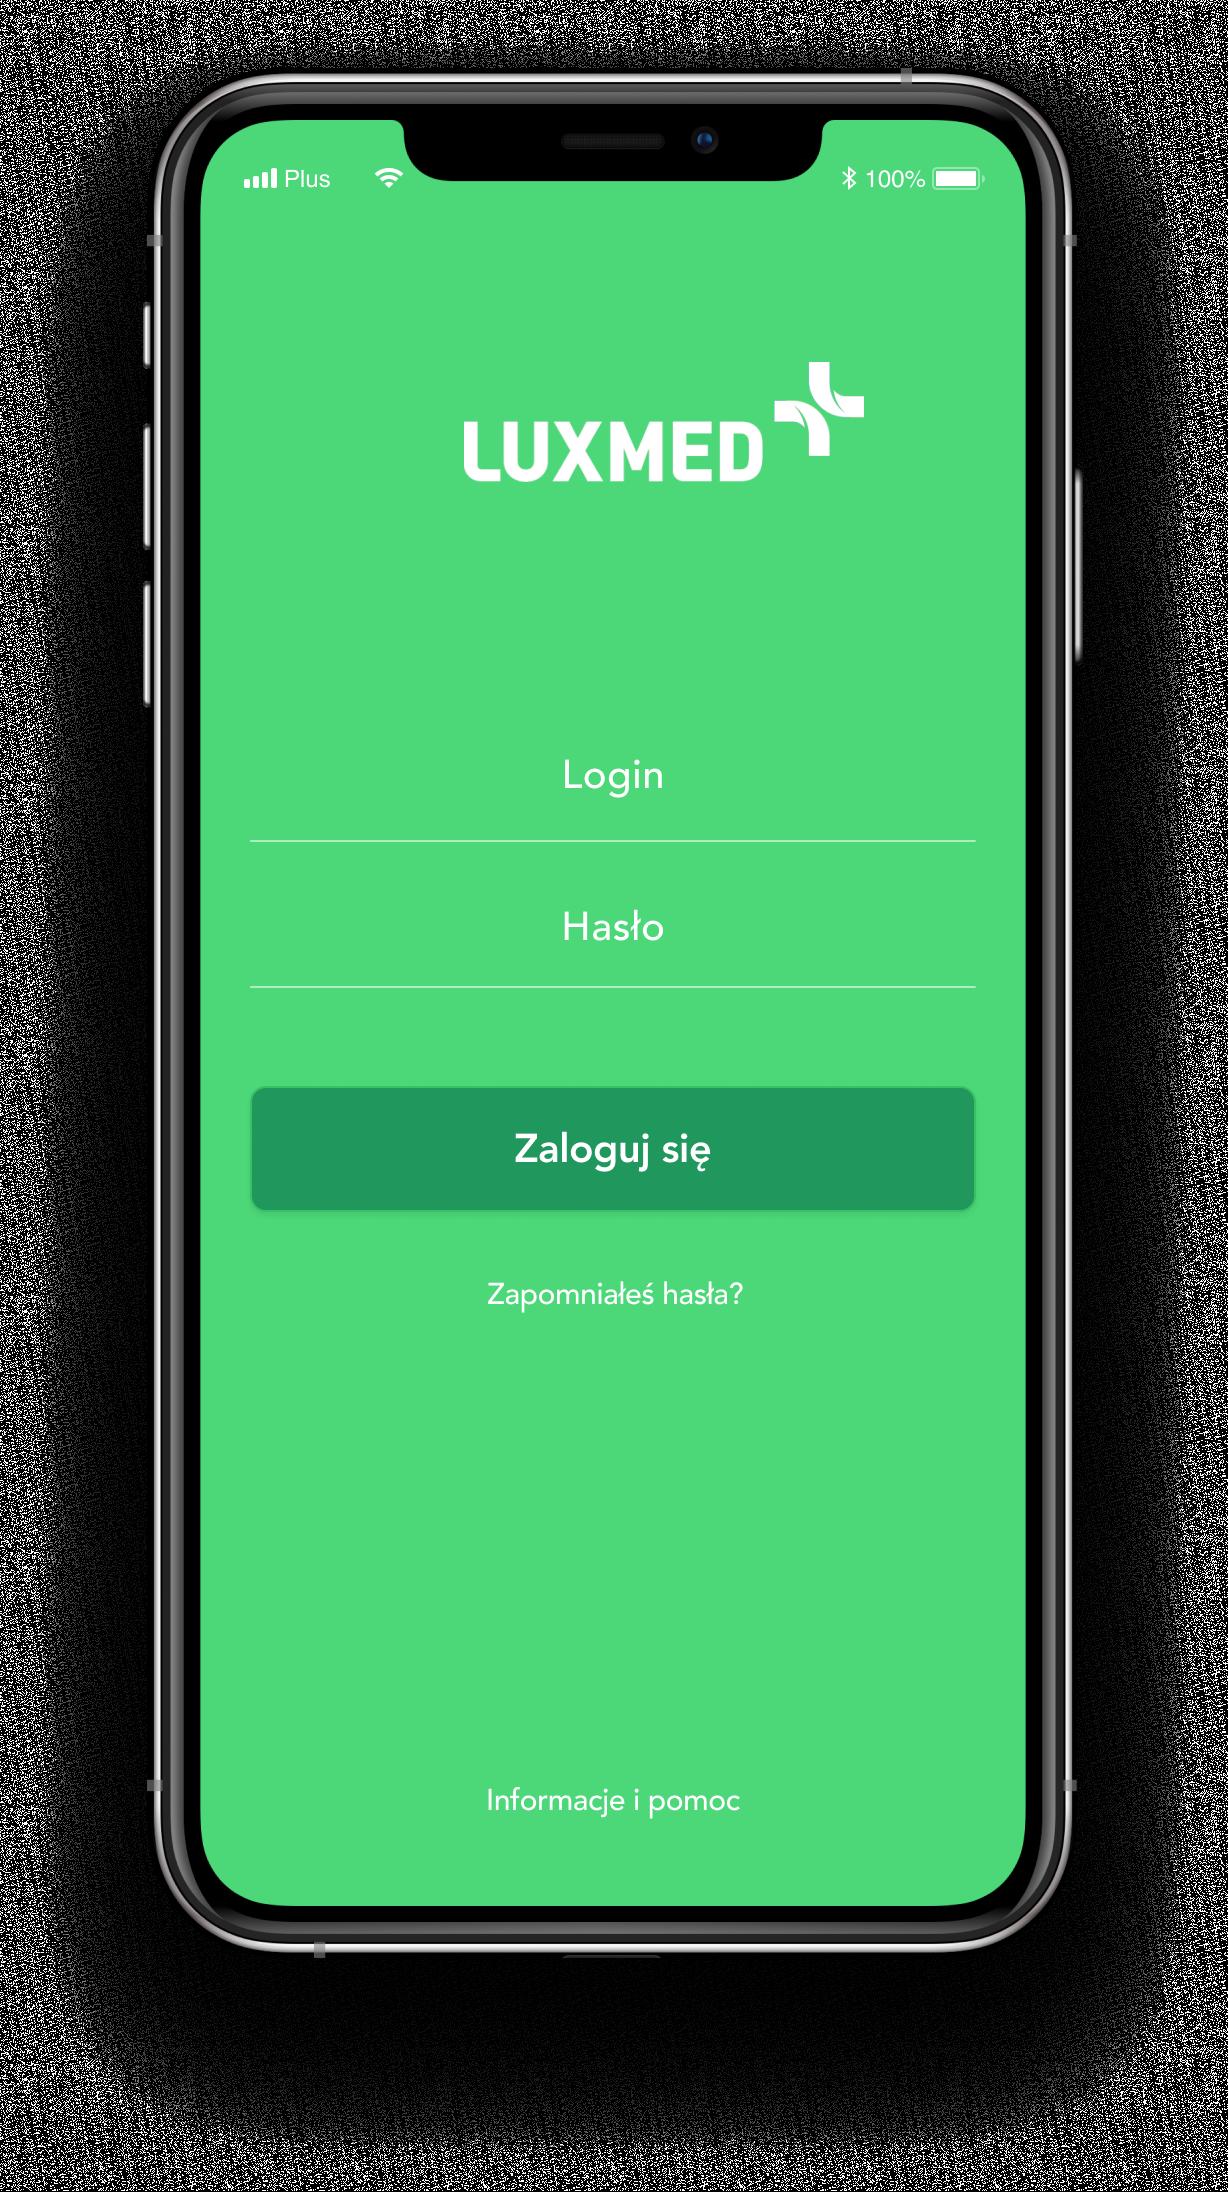 luxmed aplikacja mobilna invest 01